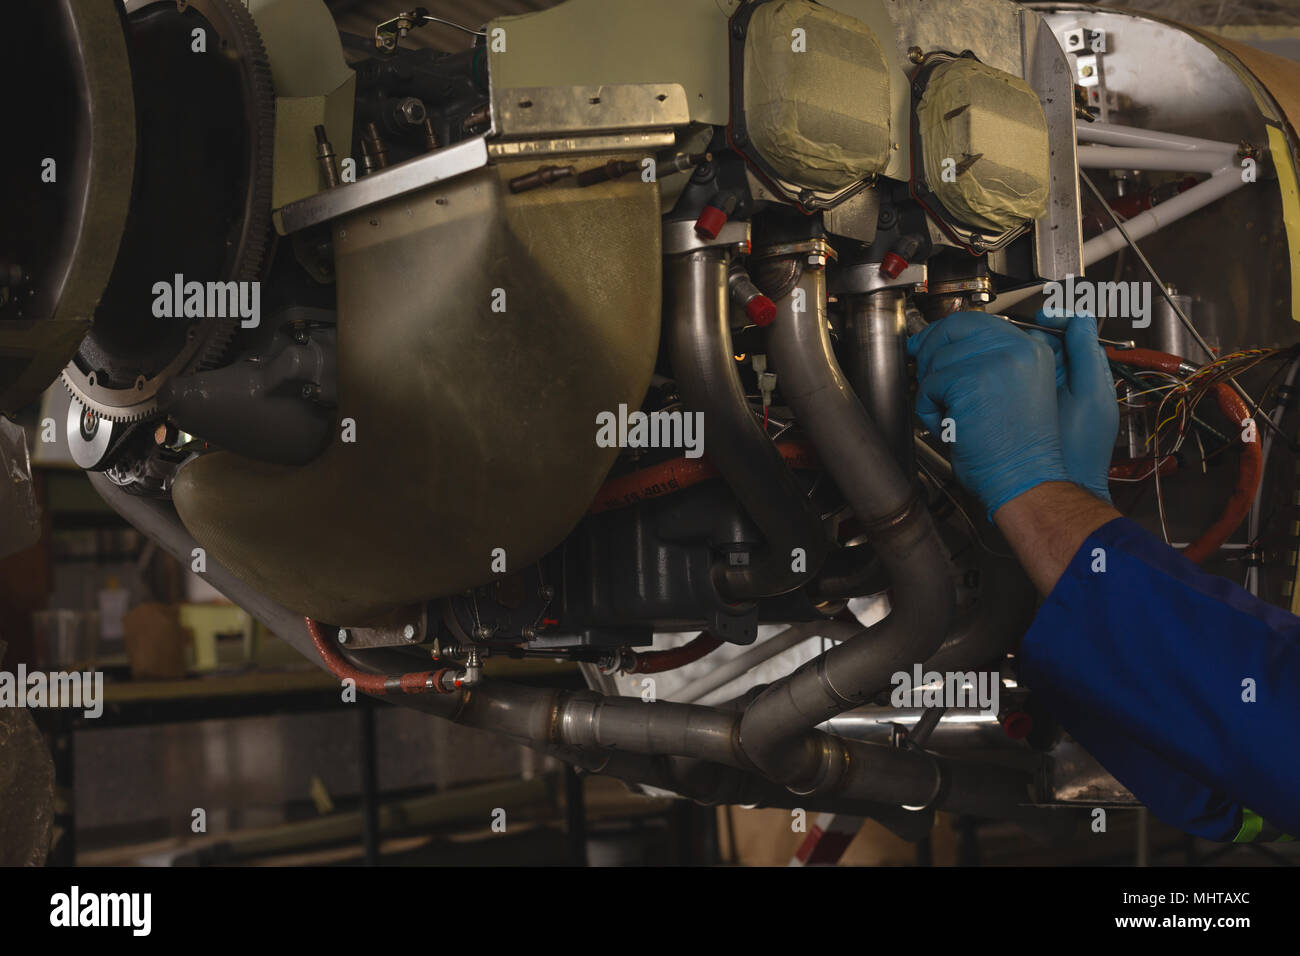 Engineer repairing aircraft engine in hangar - Stock Image